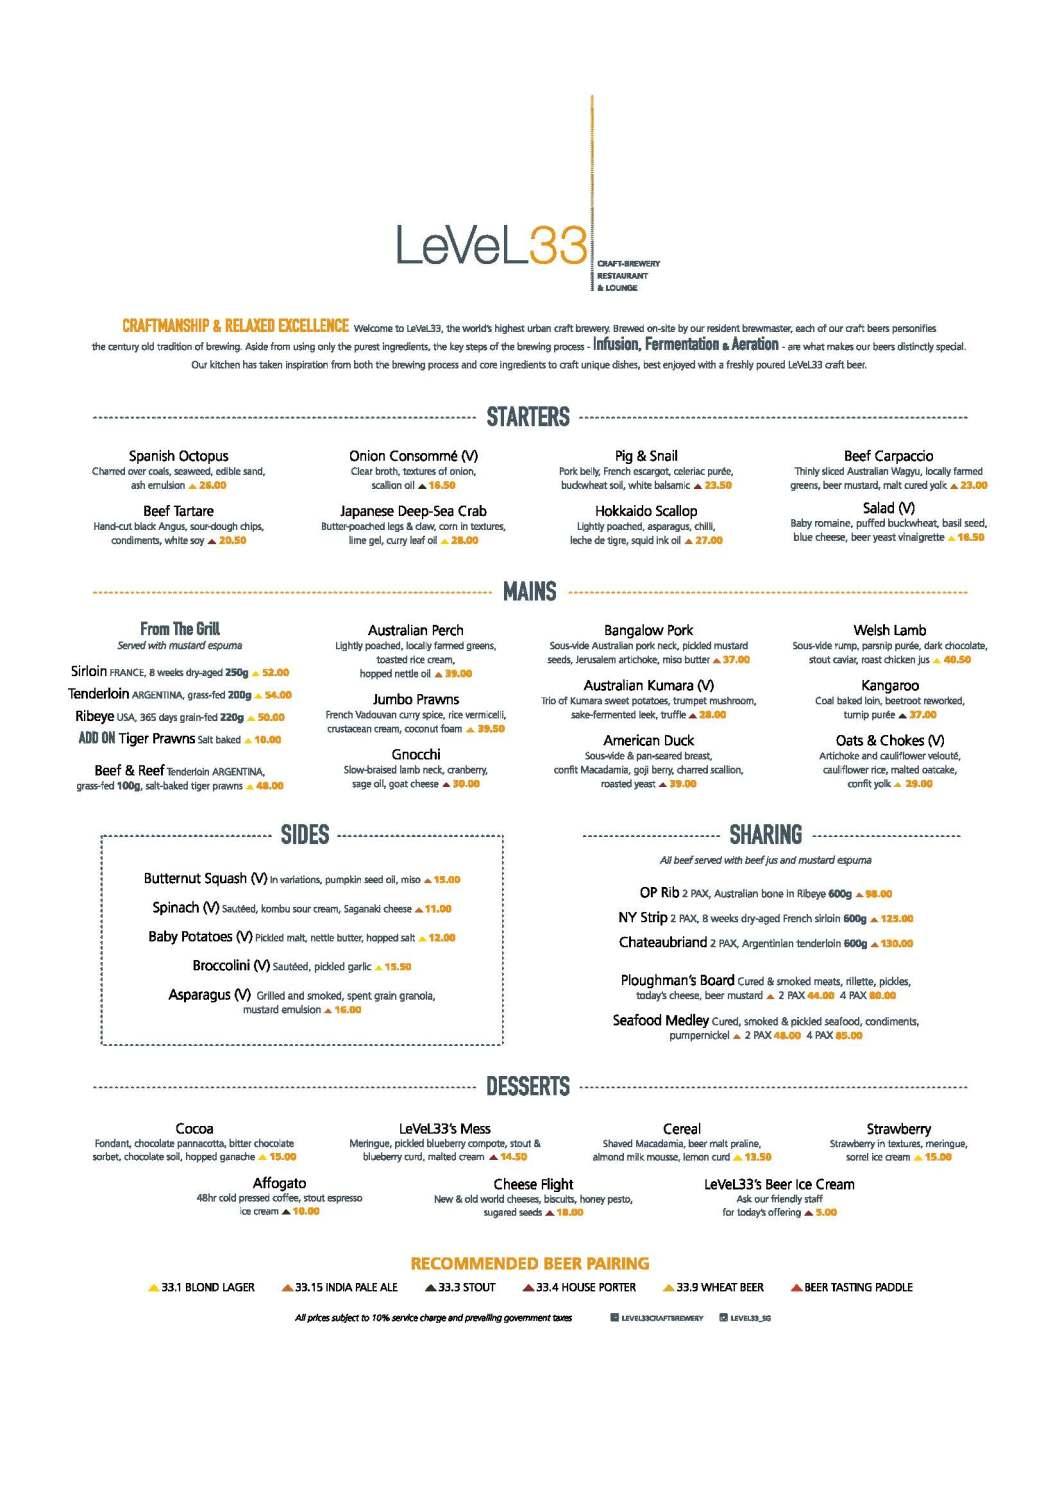 LeVeL33 Dinner Menu